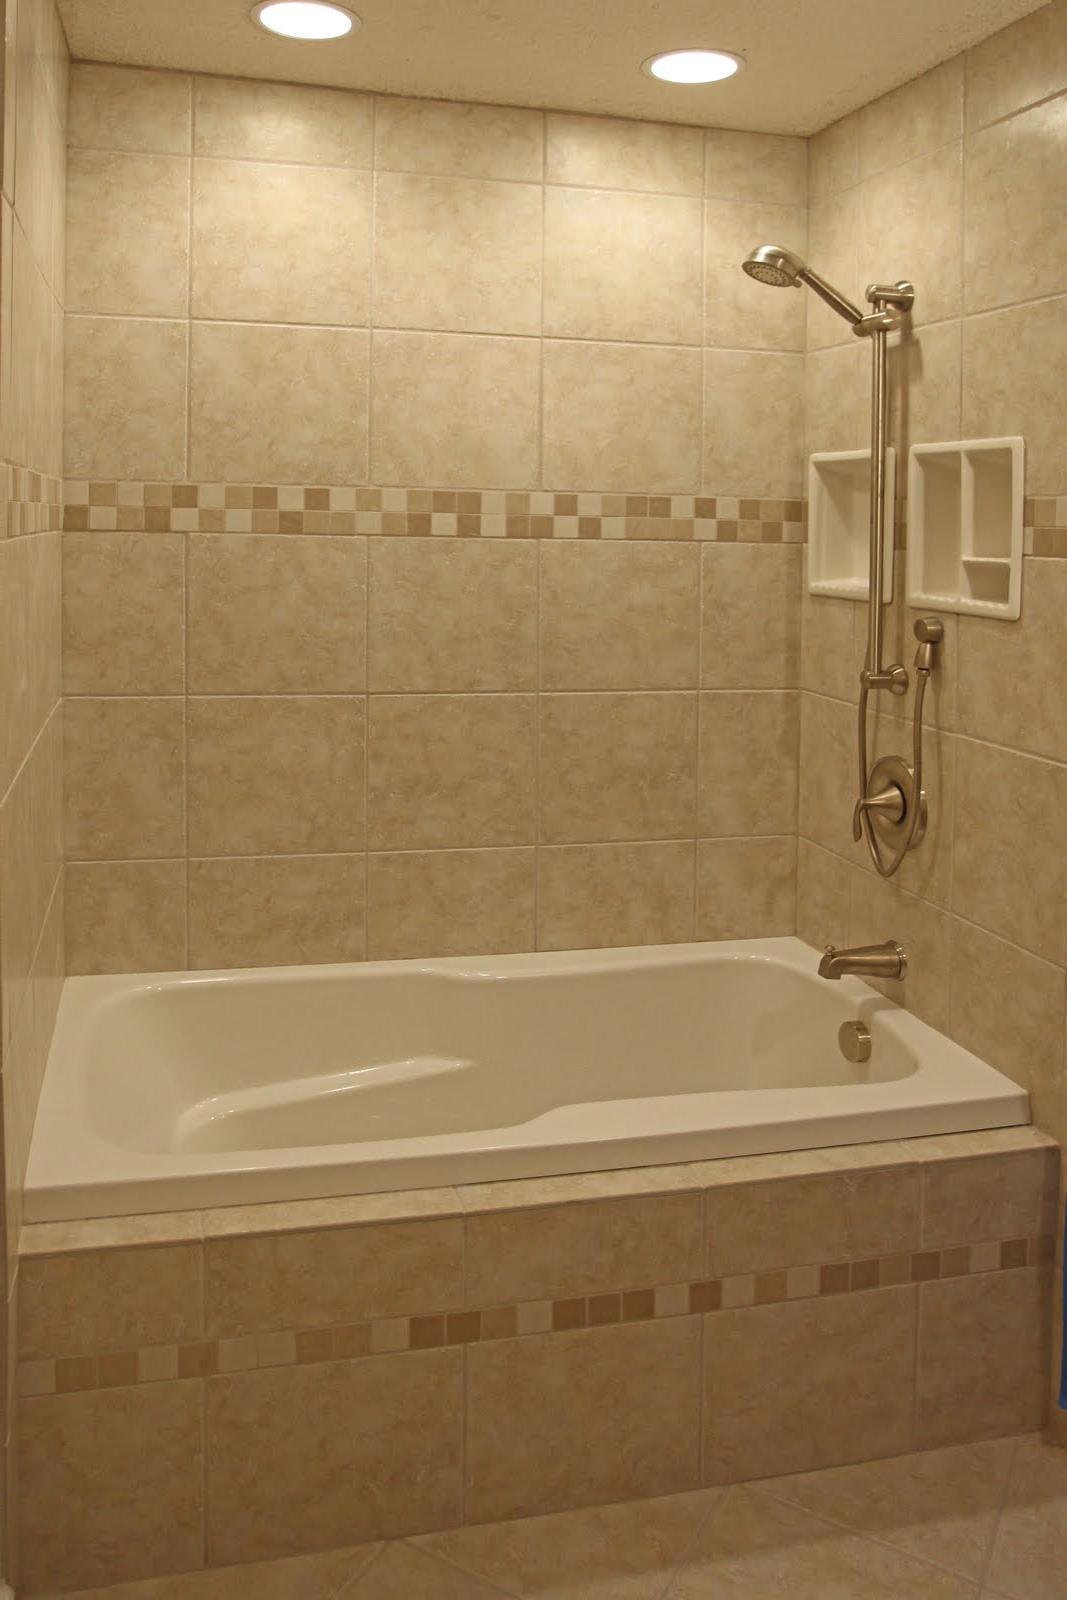 Ceramic tile ideas for small bathrooms - Great Ideas About Bathroom Ceramic Tile Gallery Bathroom Ceramic Tile